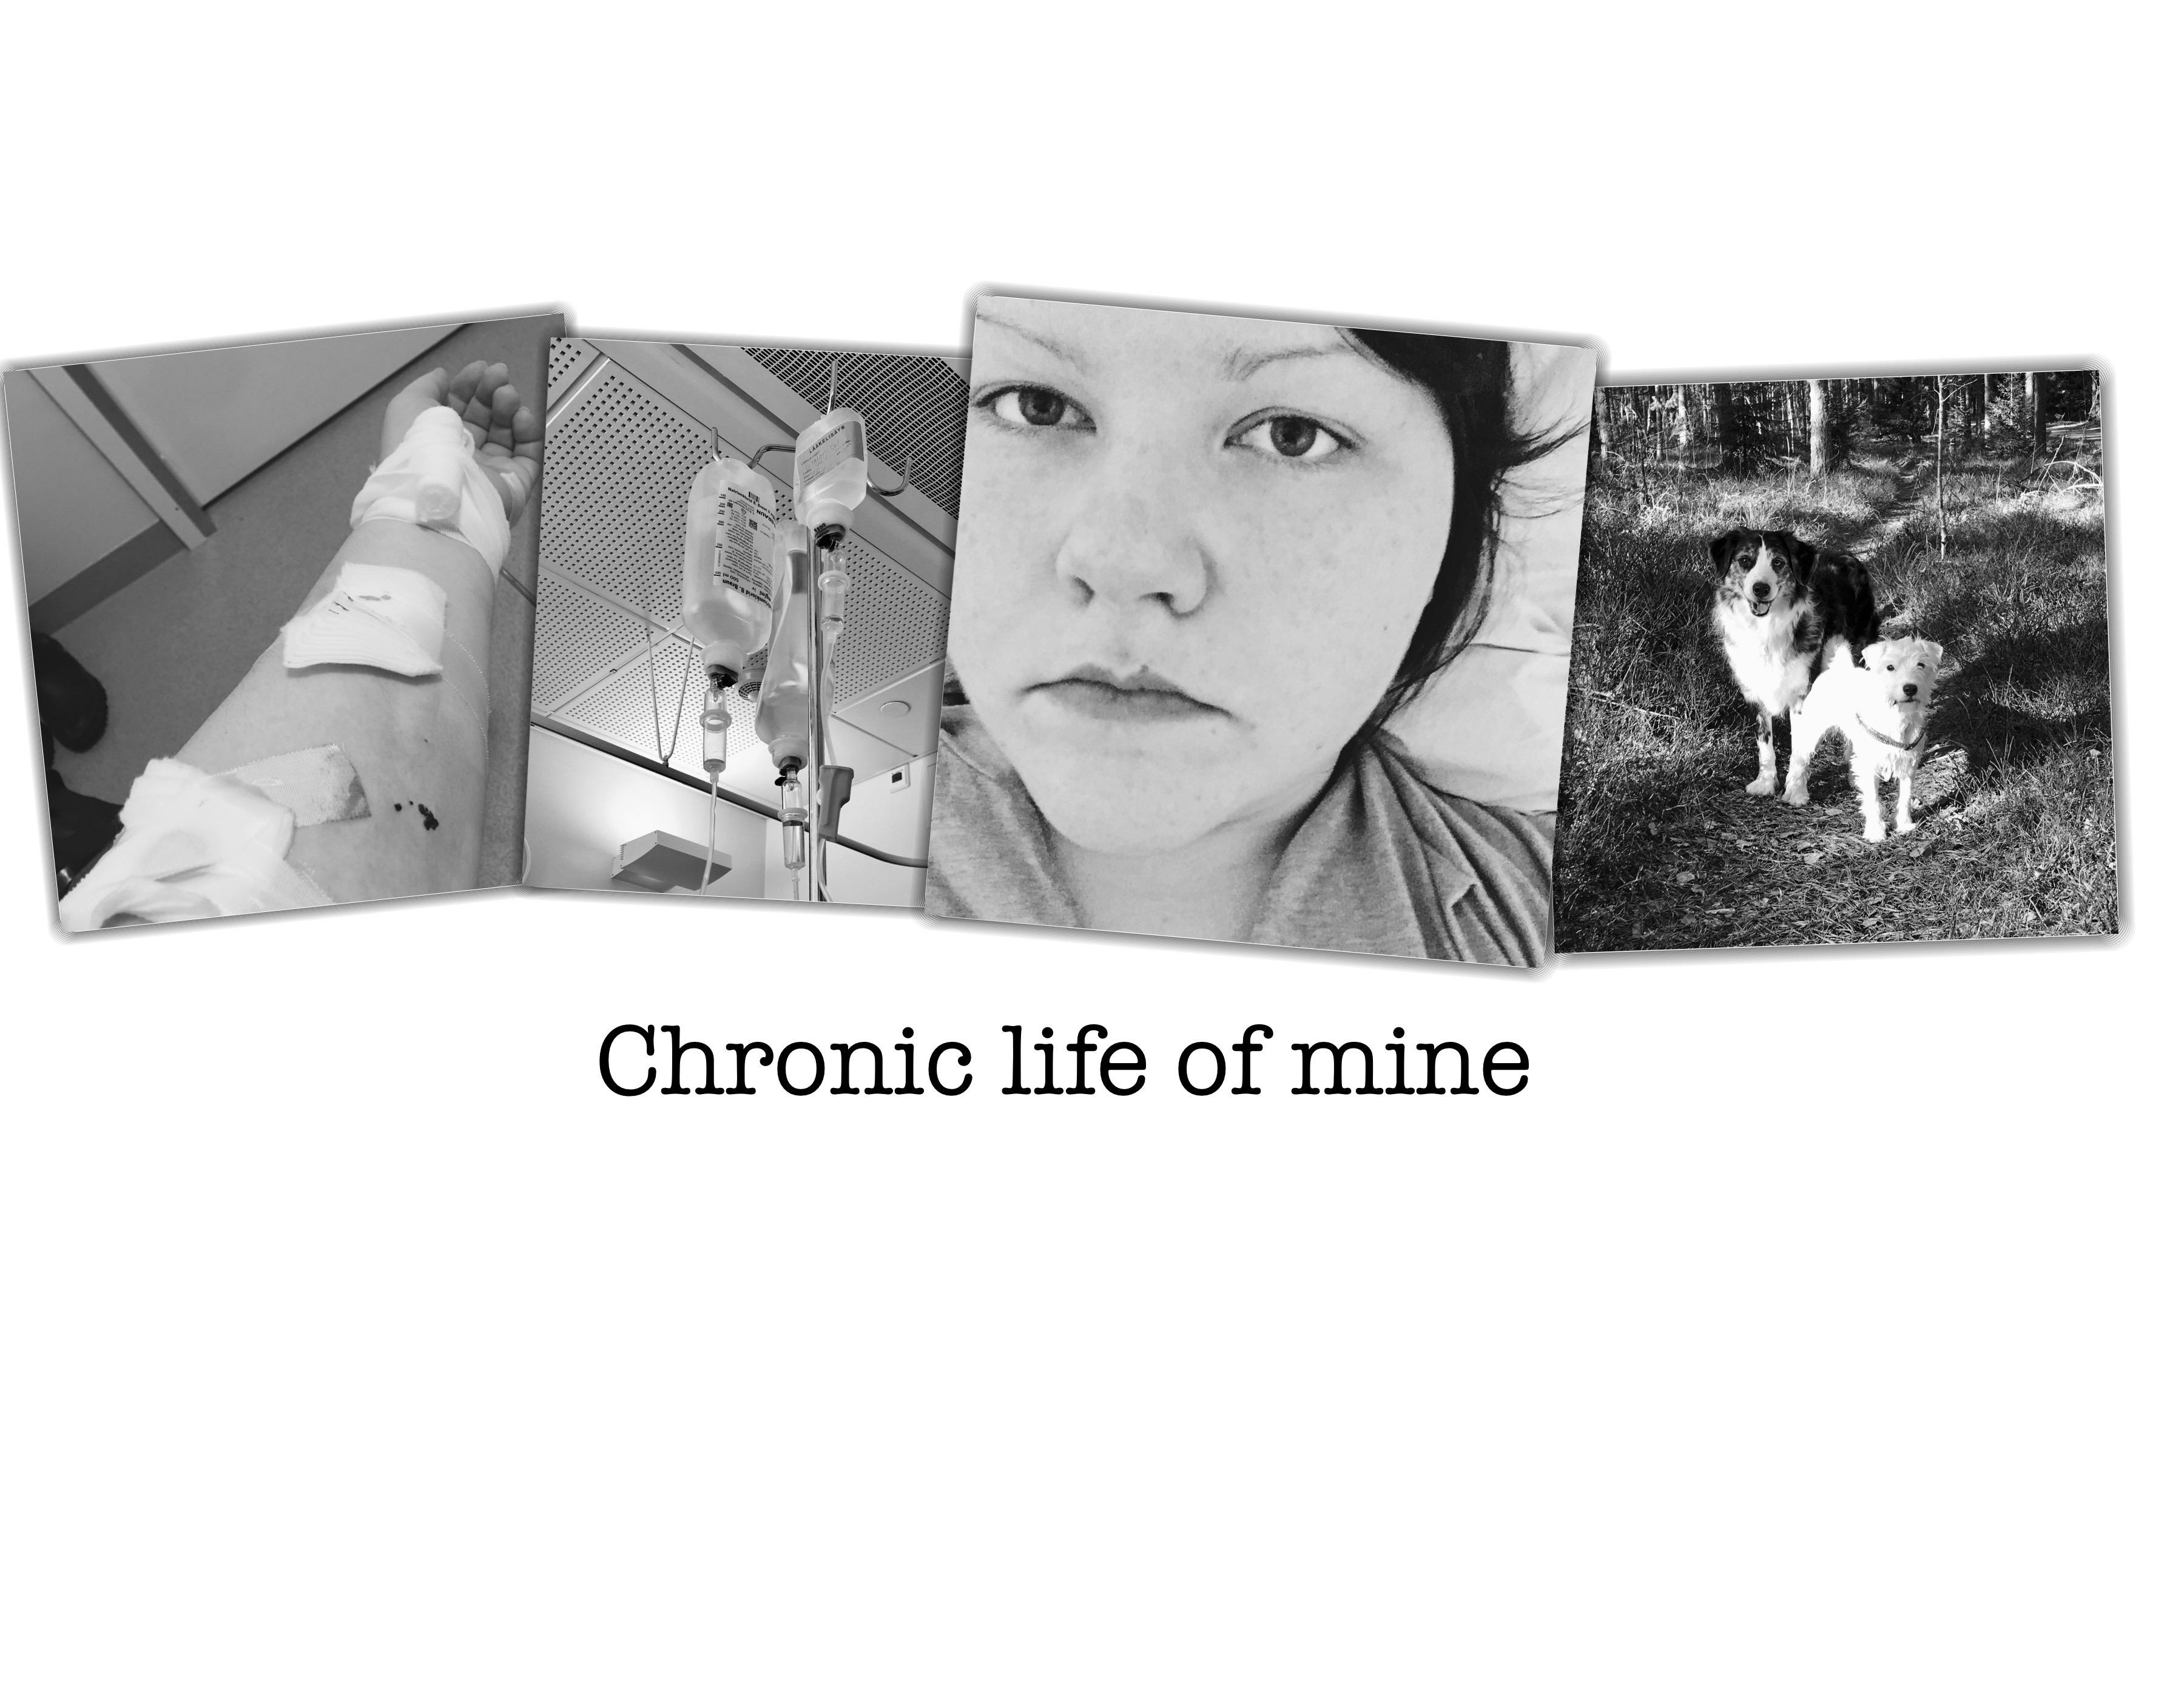 Chronic life of mine